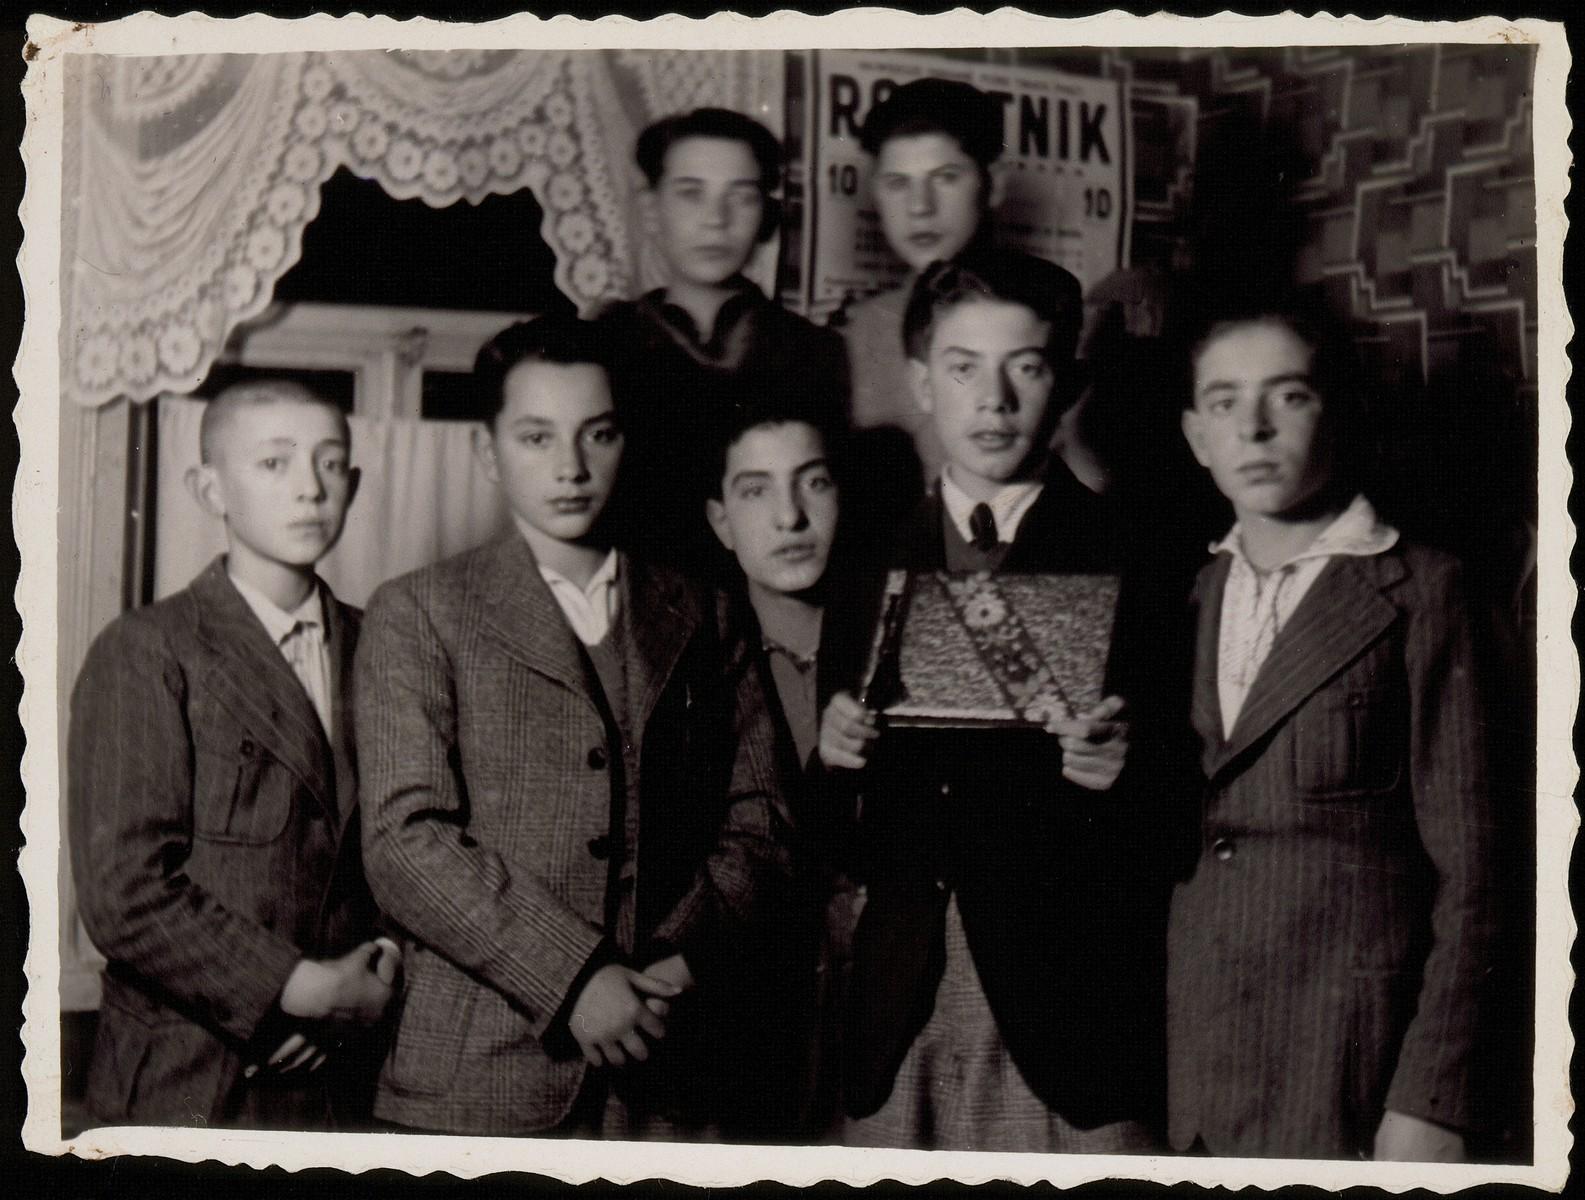 Fishke Shlanski receives an album with the pictures of his friends prior to his immigration to America.  Standing from right to left: Moshe Ginunski, Fishke Shlanski, Zalman Zubitzki, unknown, and Bezalel Charney.  Standing on top from right to left: Tuvia Blacher and Benjamin Shlanski.